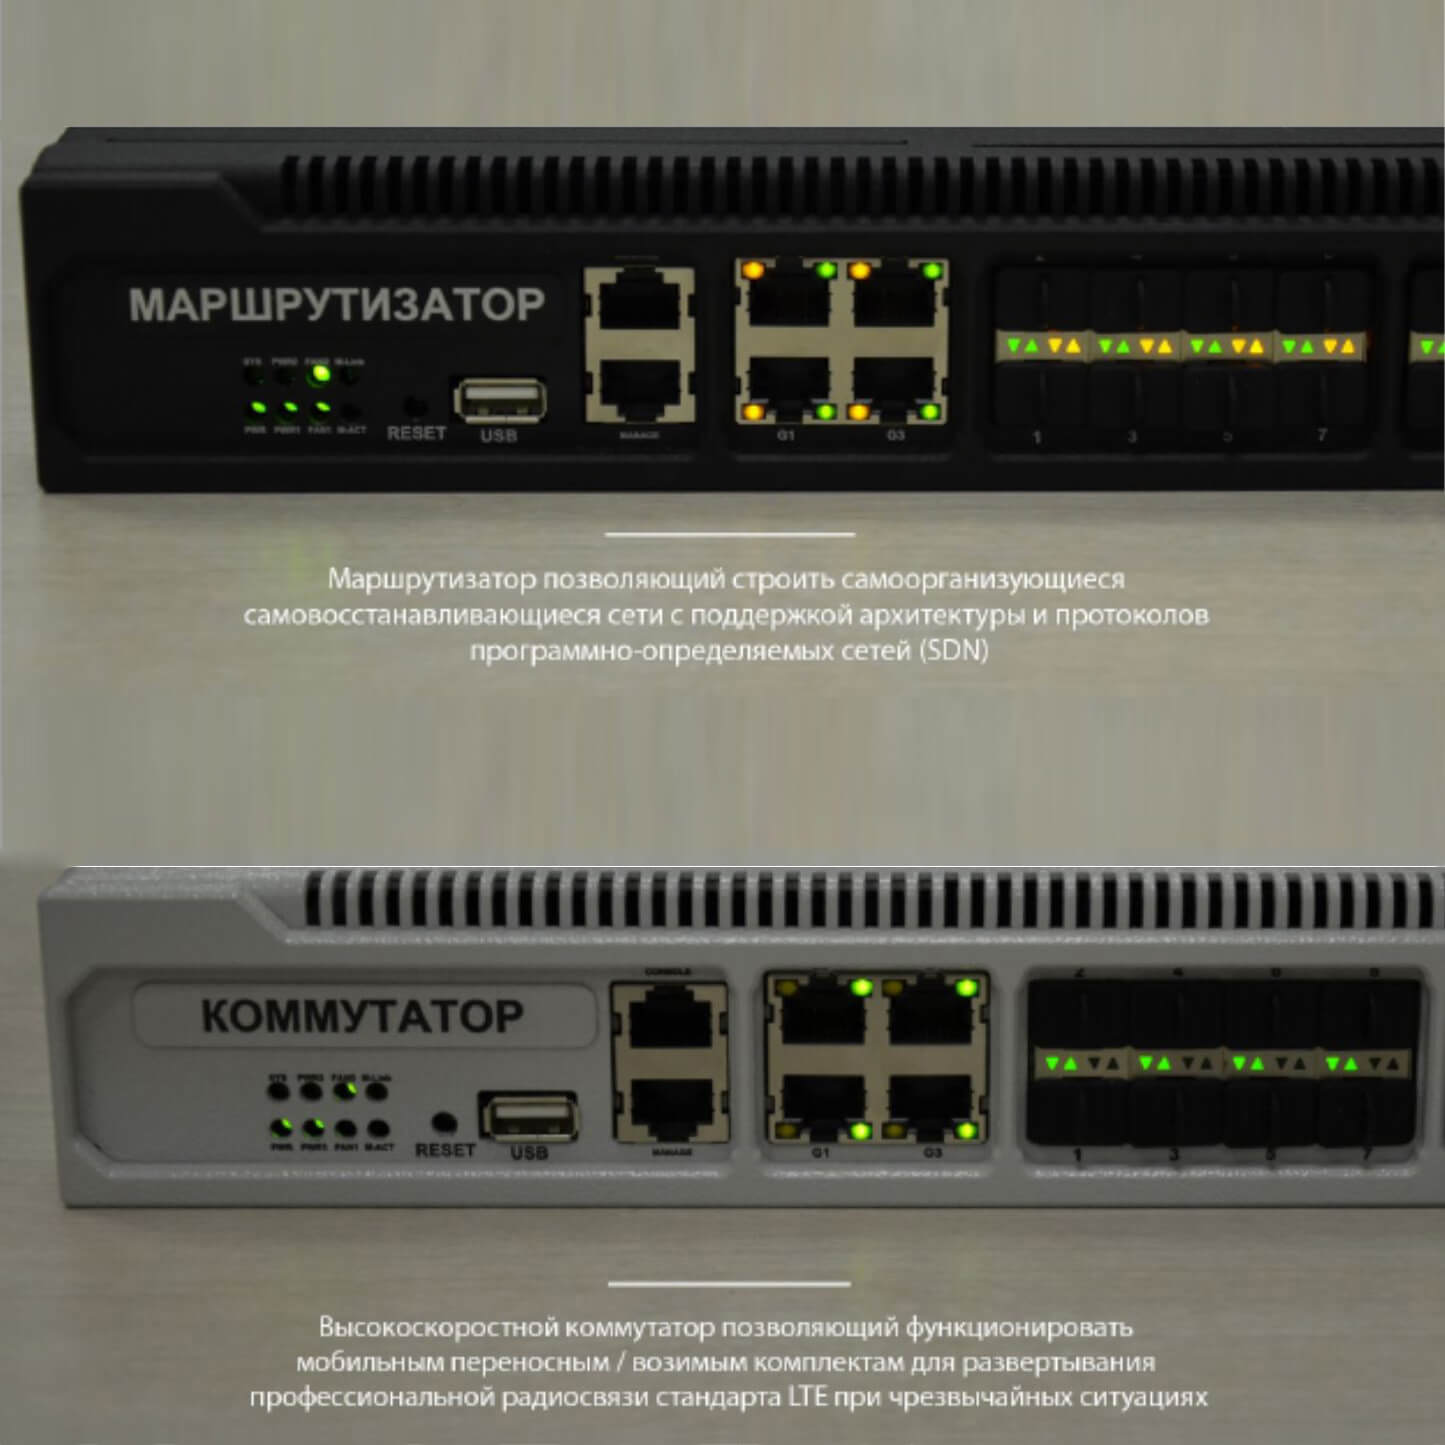 Equipment for fiber-optic communication lines